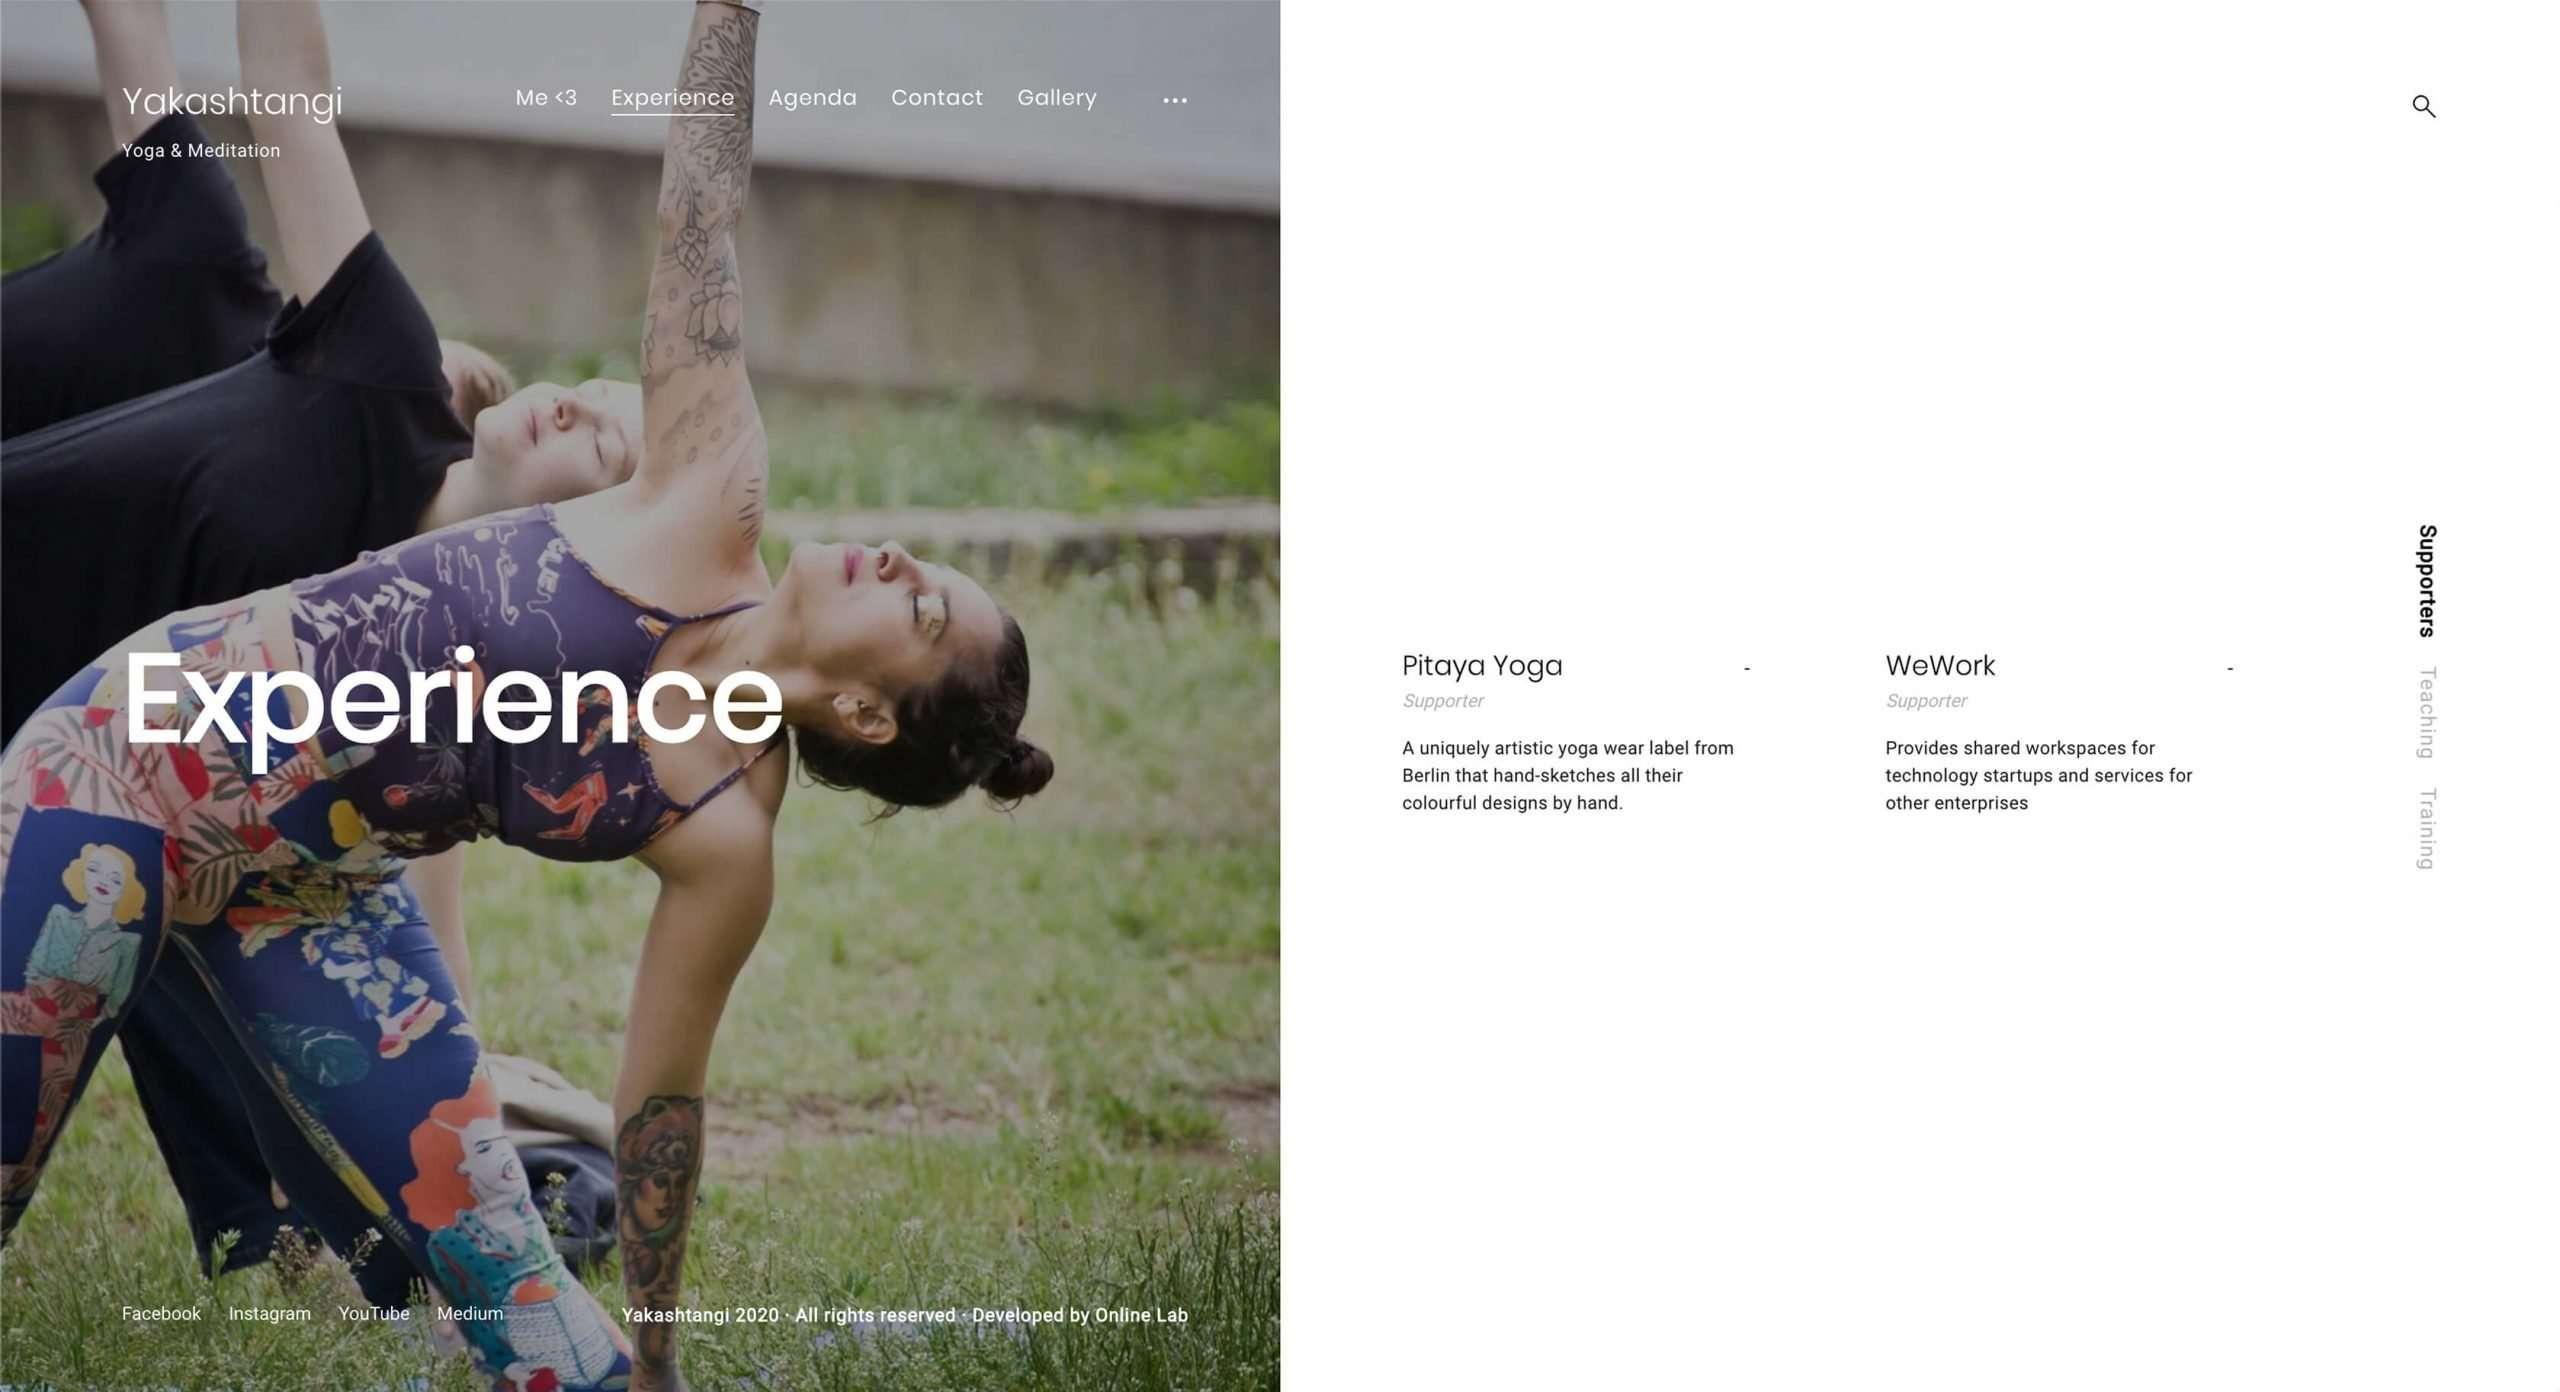 yakashtangi-yoga-meditation-berlin-online-lab-lisbon-web-development-web-design-4